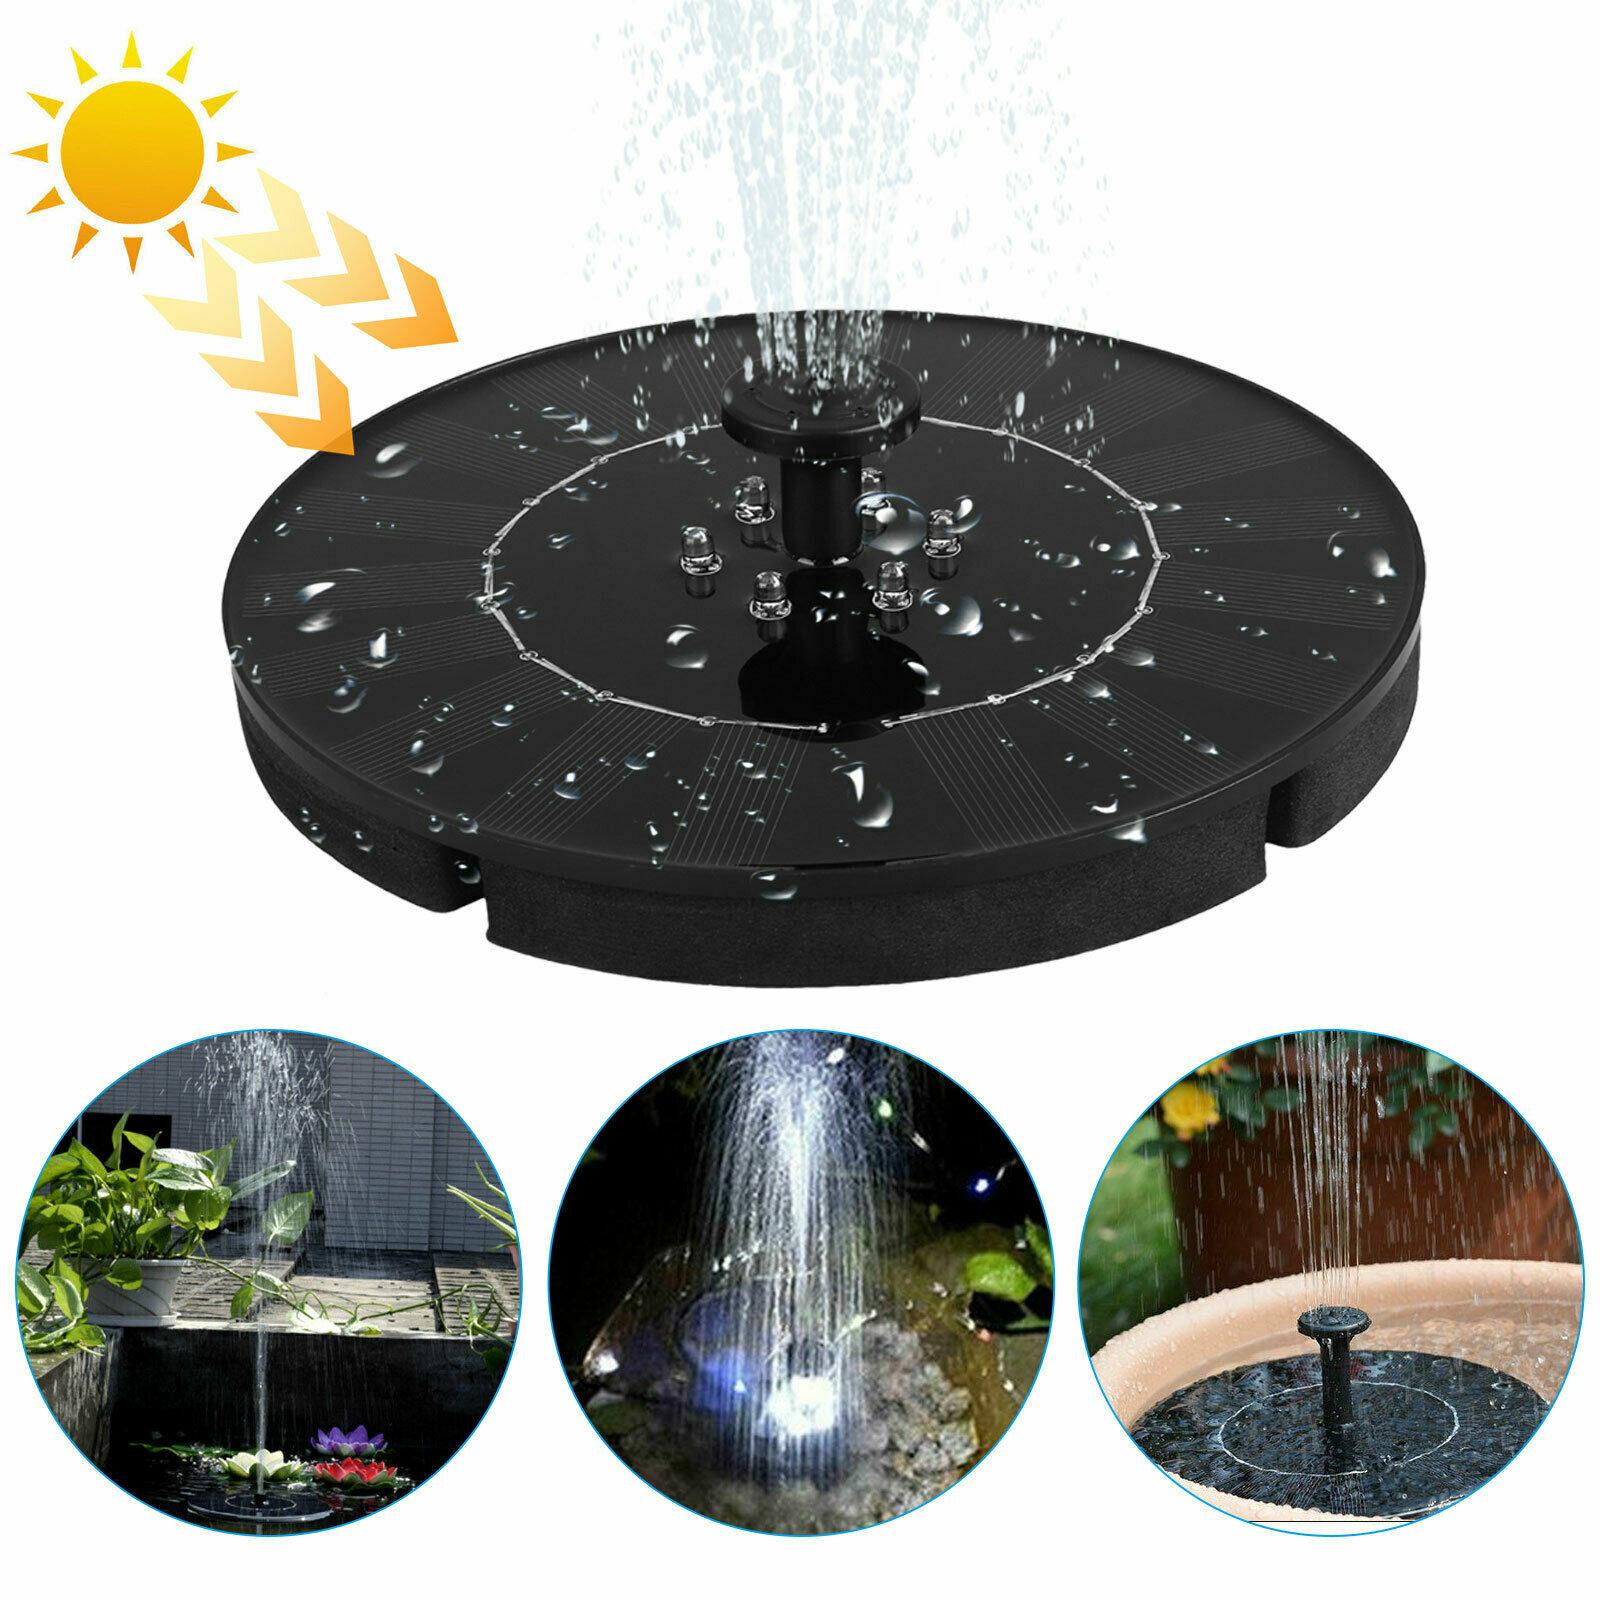 Bird Bath Floating Solar Power Fountain Pump Water Panel For Garden Pool Pond